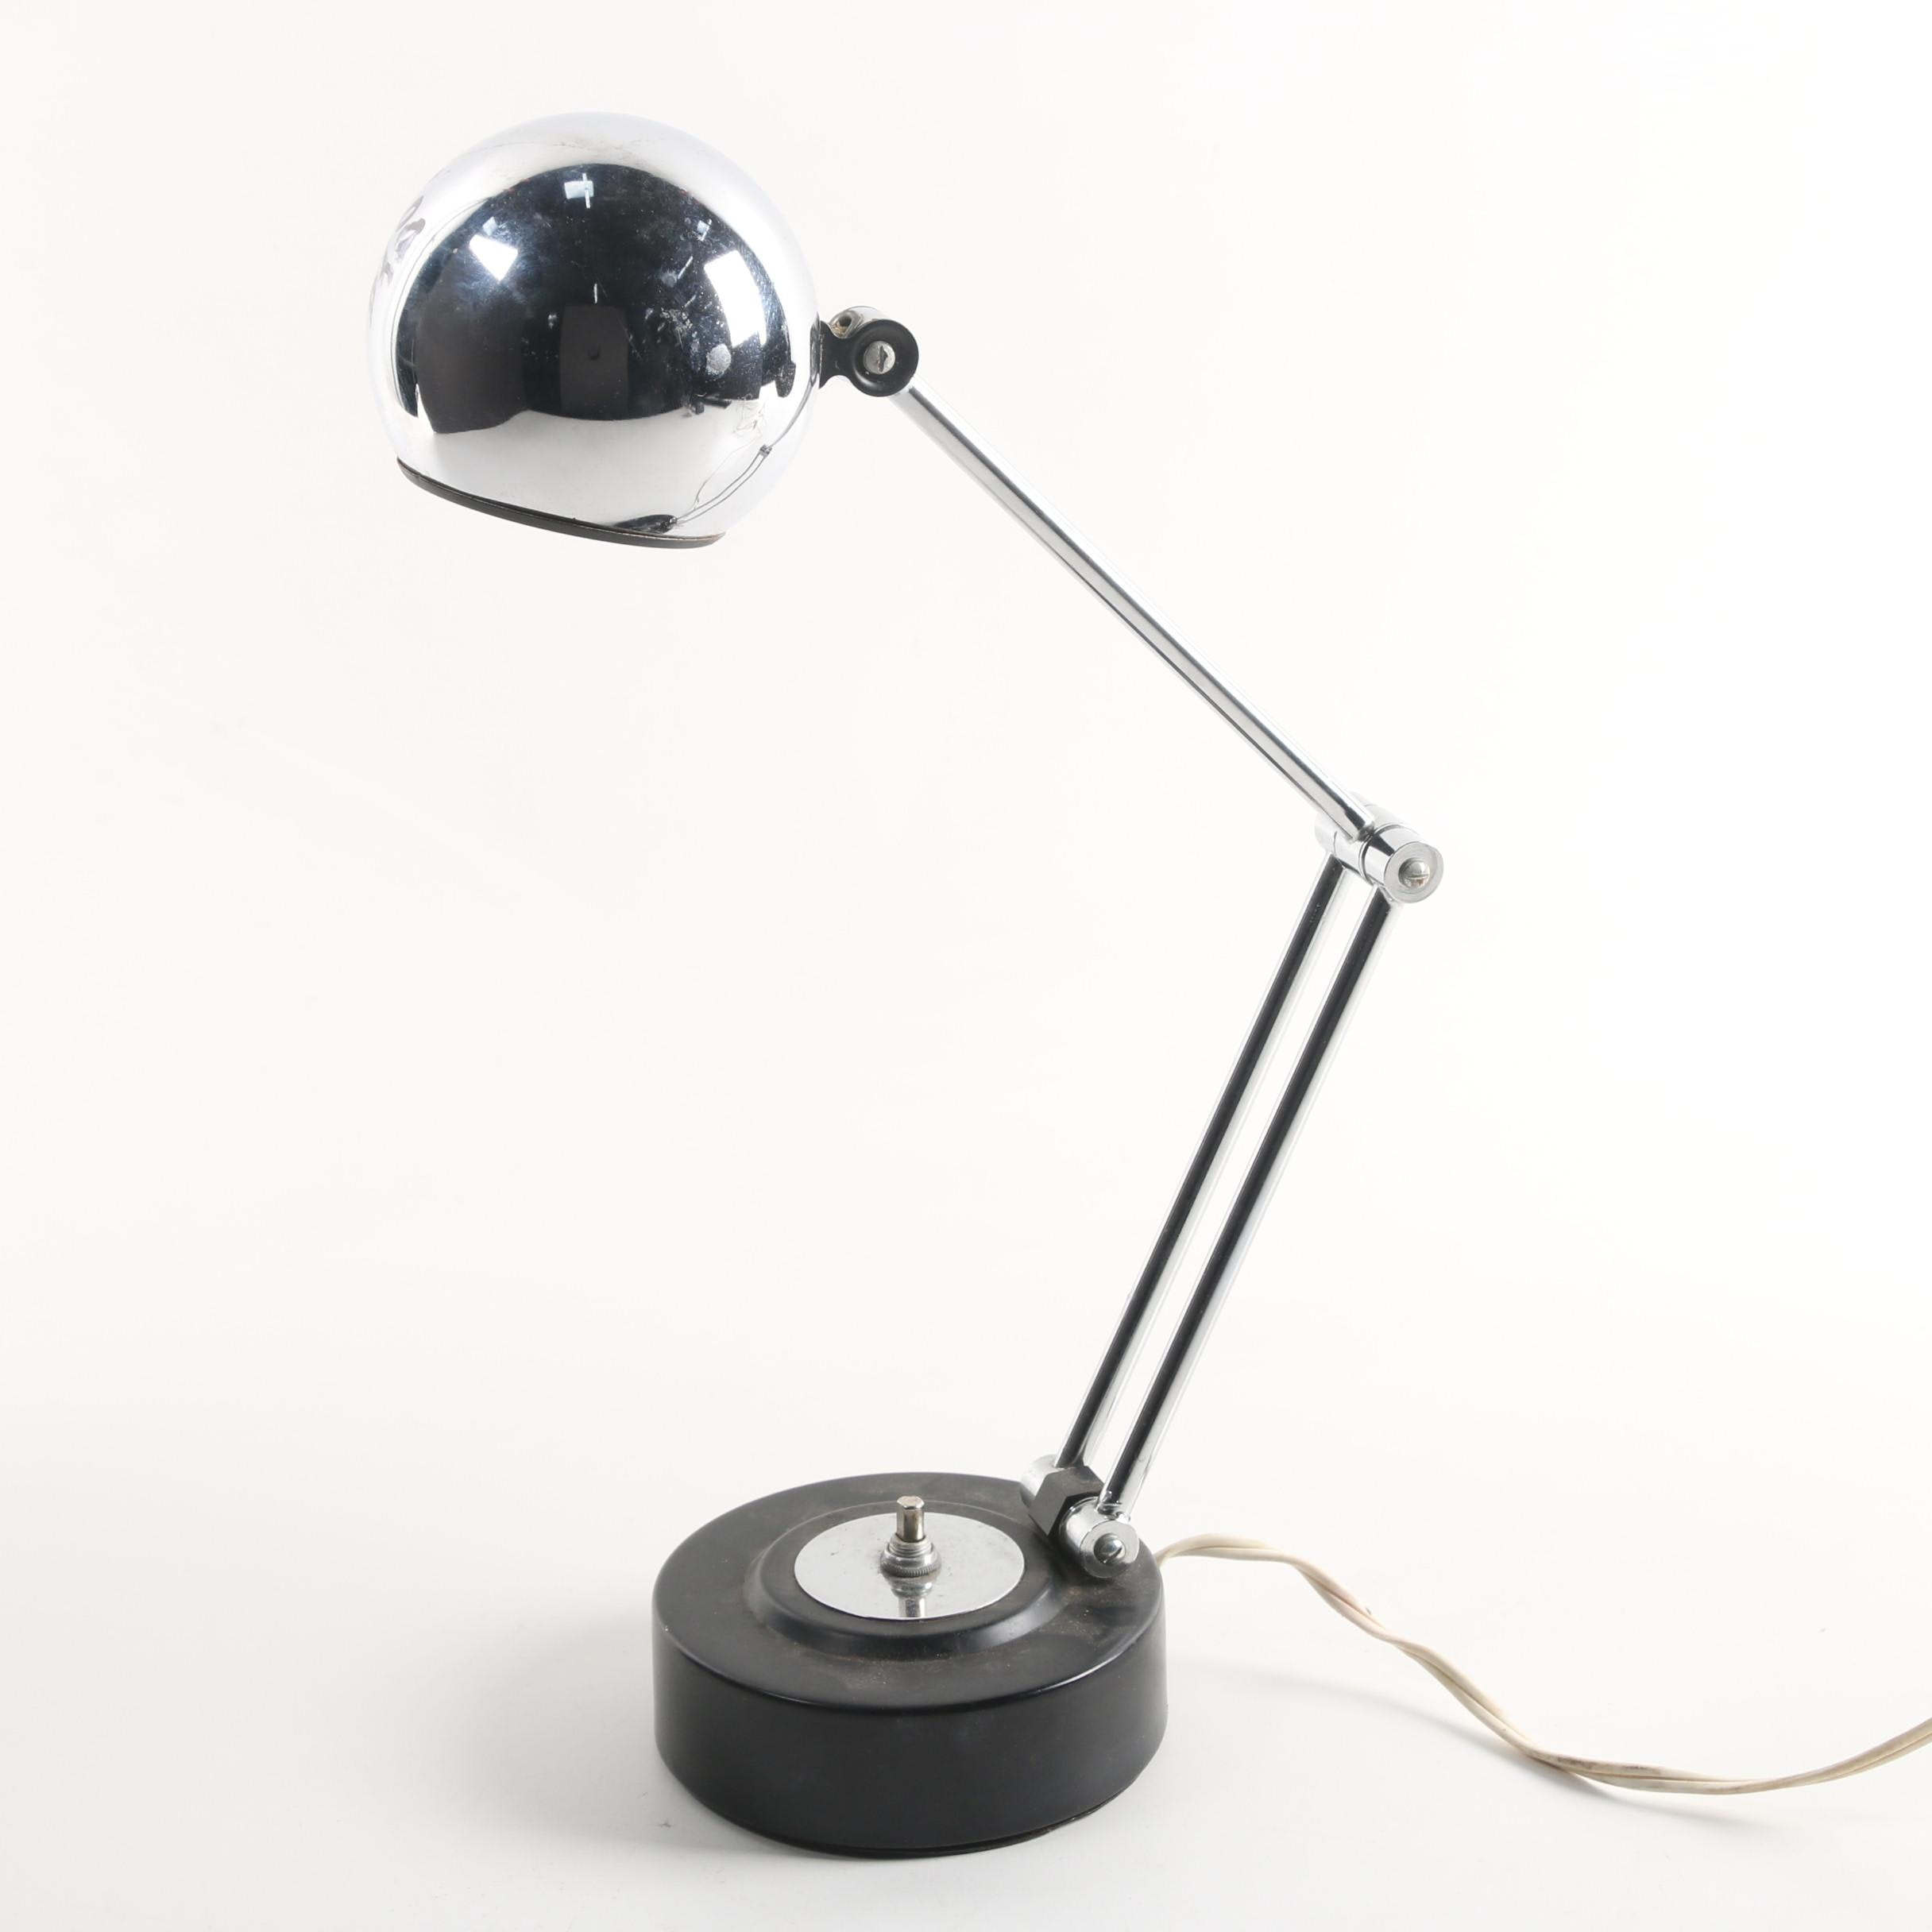 1970s Adjustable Arm Chrome Desk Lamp